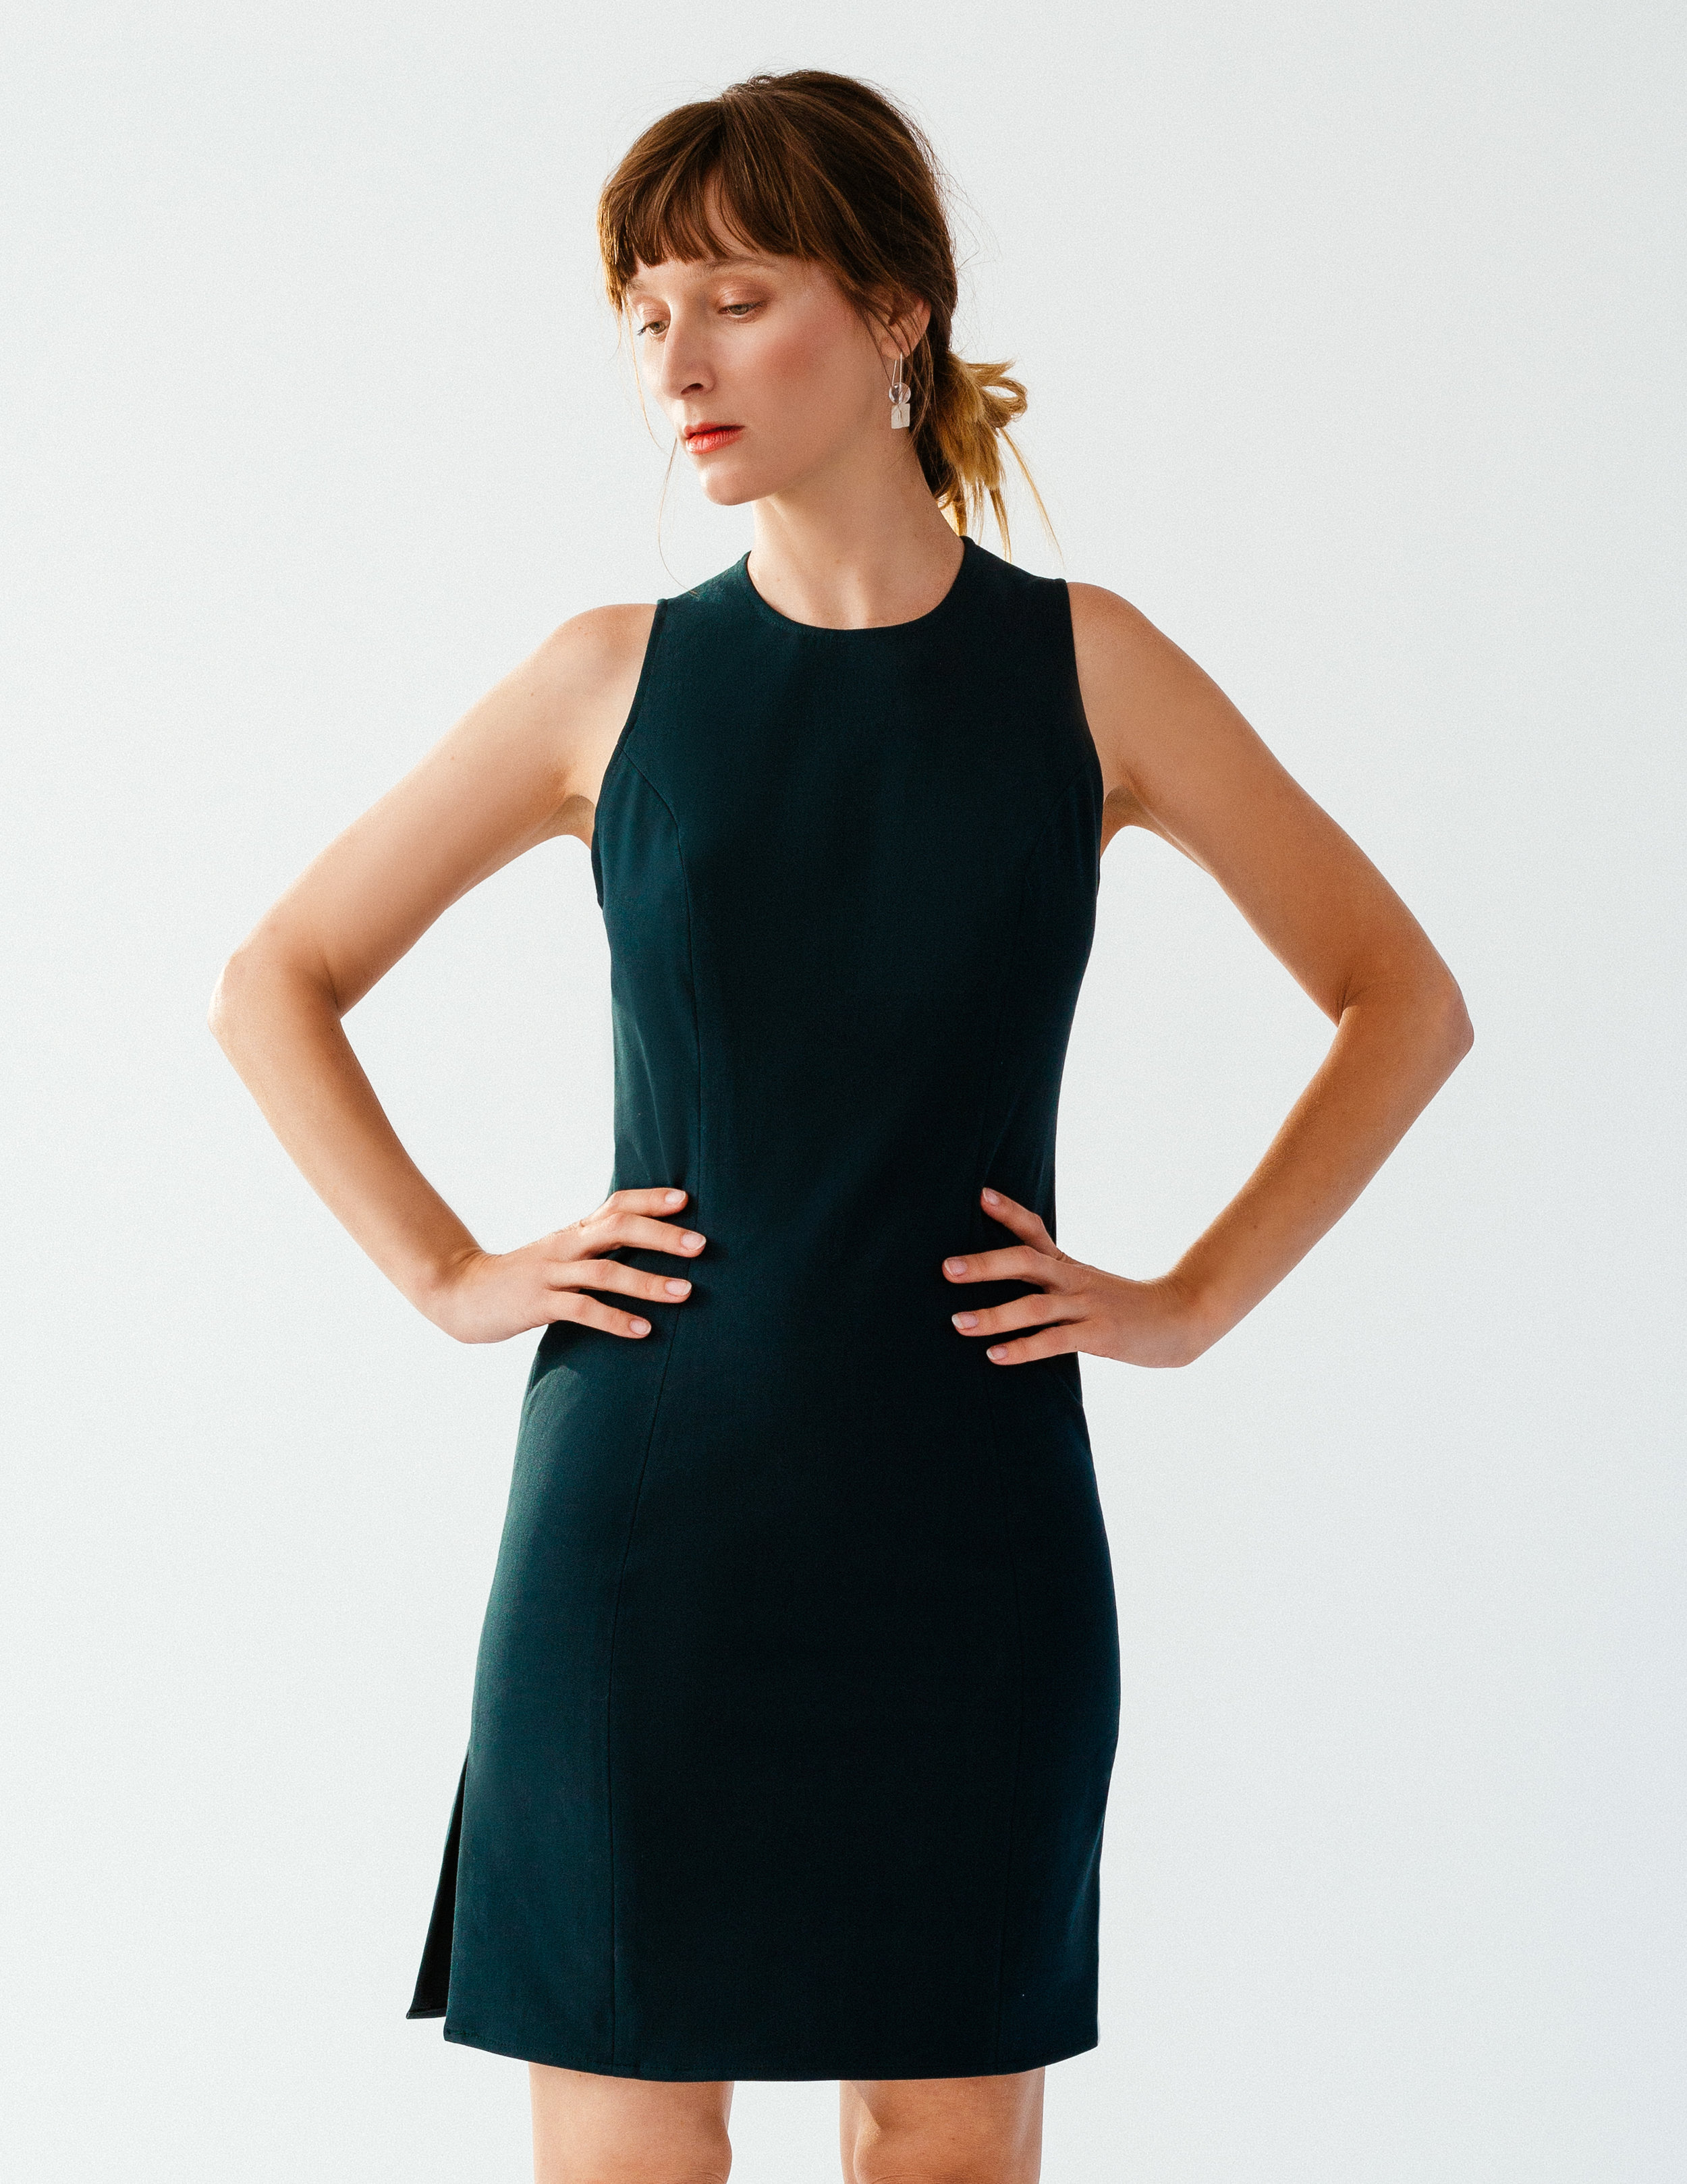 ellice ruiz_sustainable workwear_creative professionals.jpg